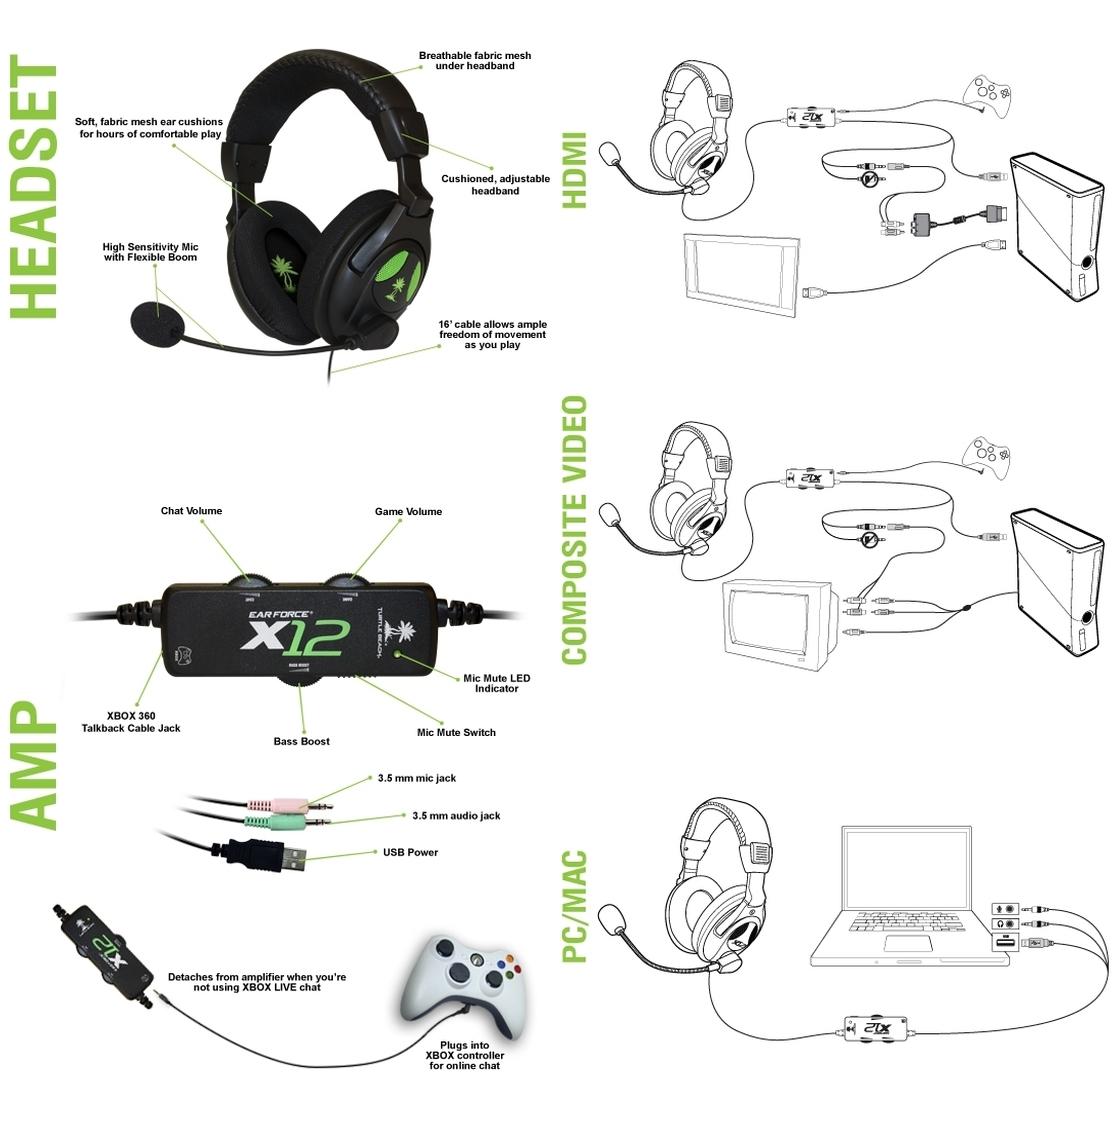 Casti Gaming Turtle Beach Ear Force X12 Black Pentru Pc Si